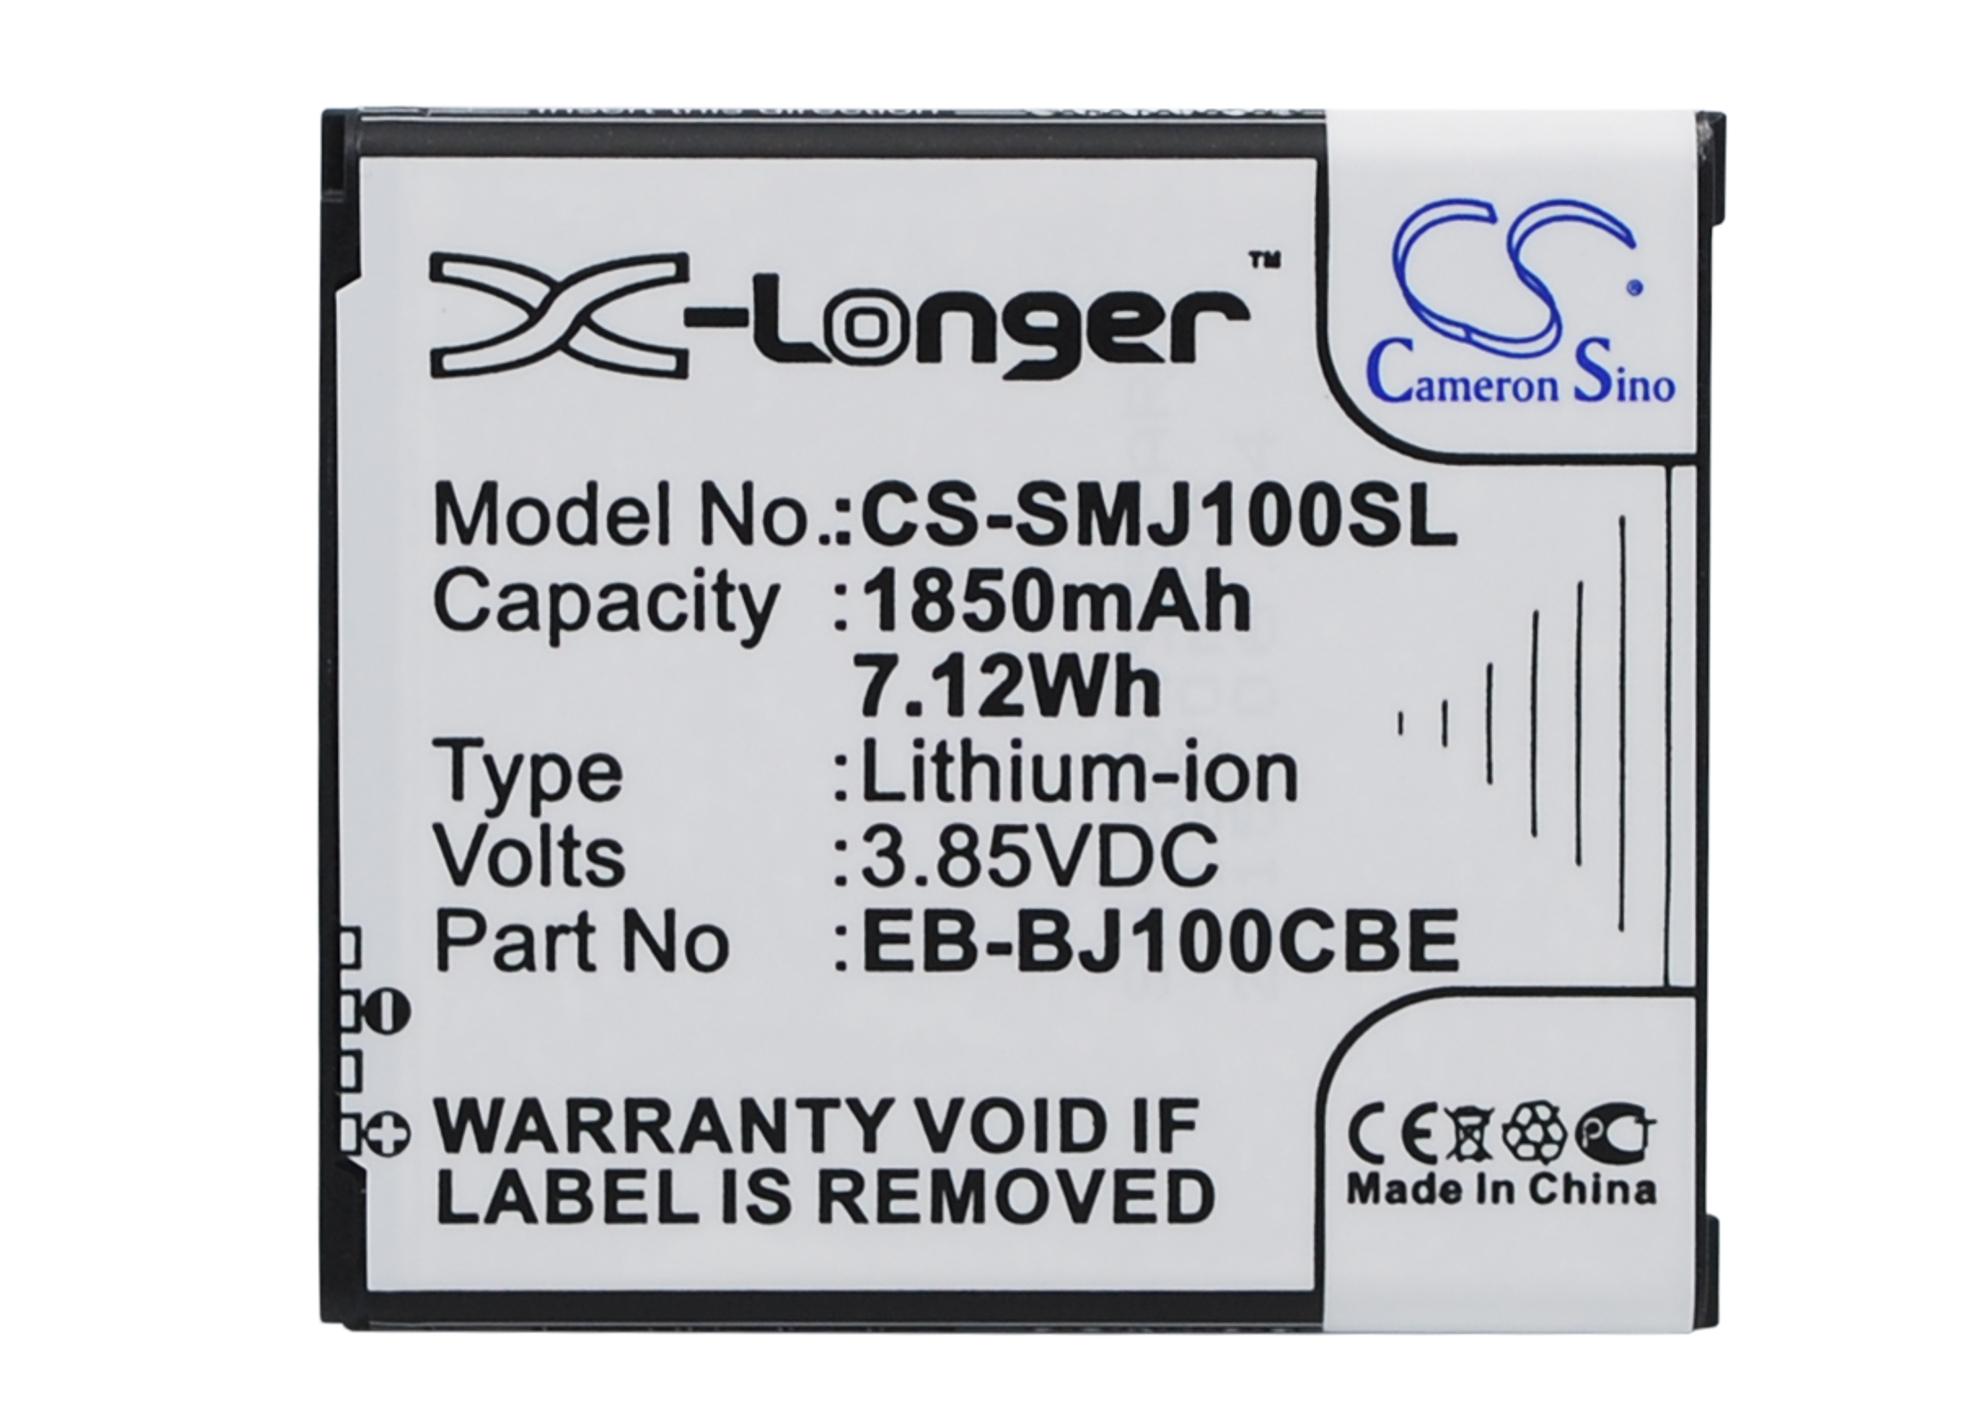 Cameron Sino baterie do mobilů pro SAMSUNG SM-J100H/DS 3.85V Li-ion 1850mAh černá - neoriginální